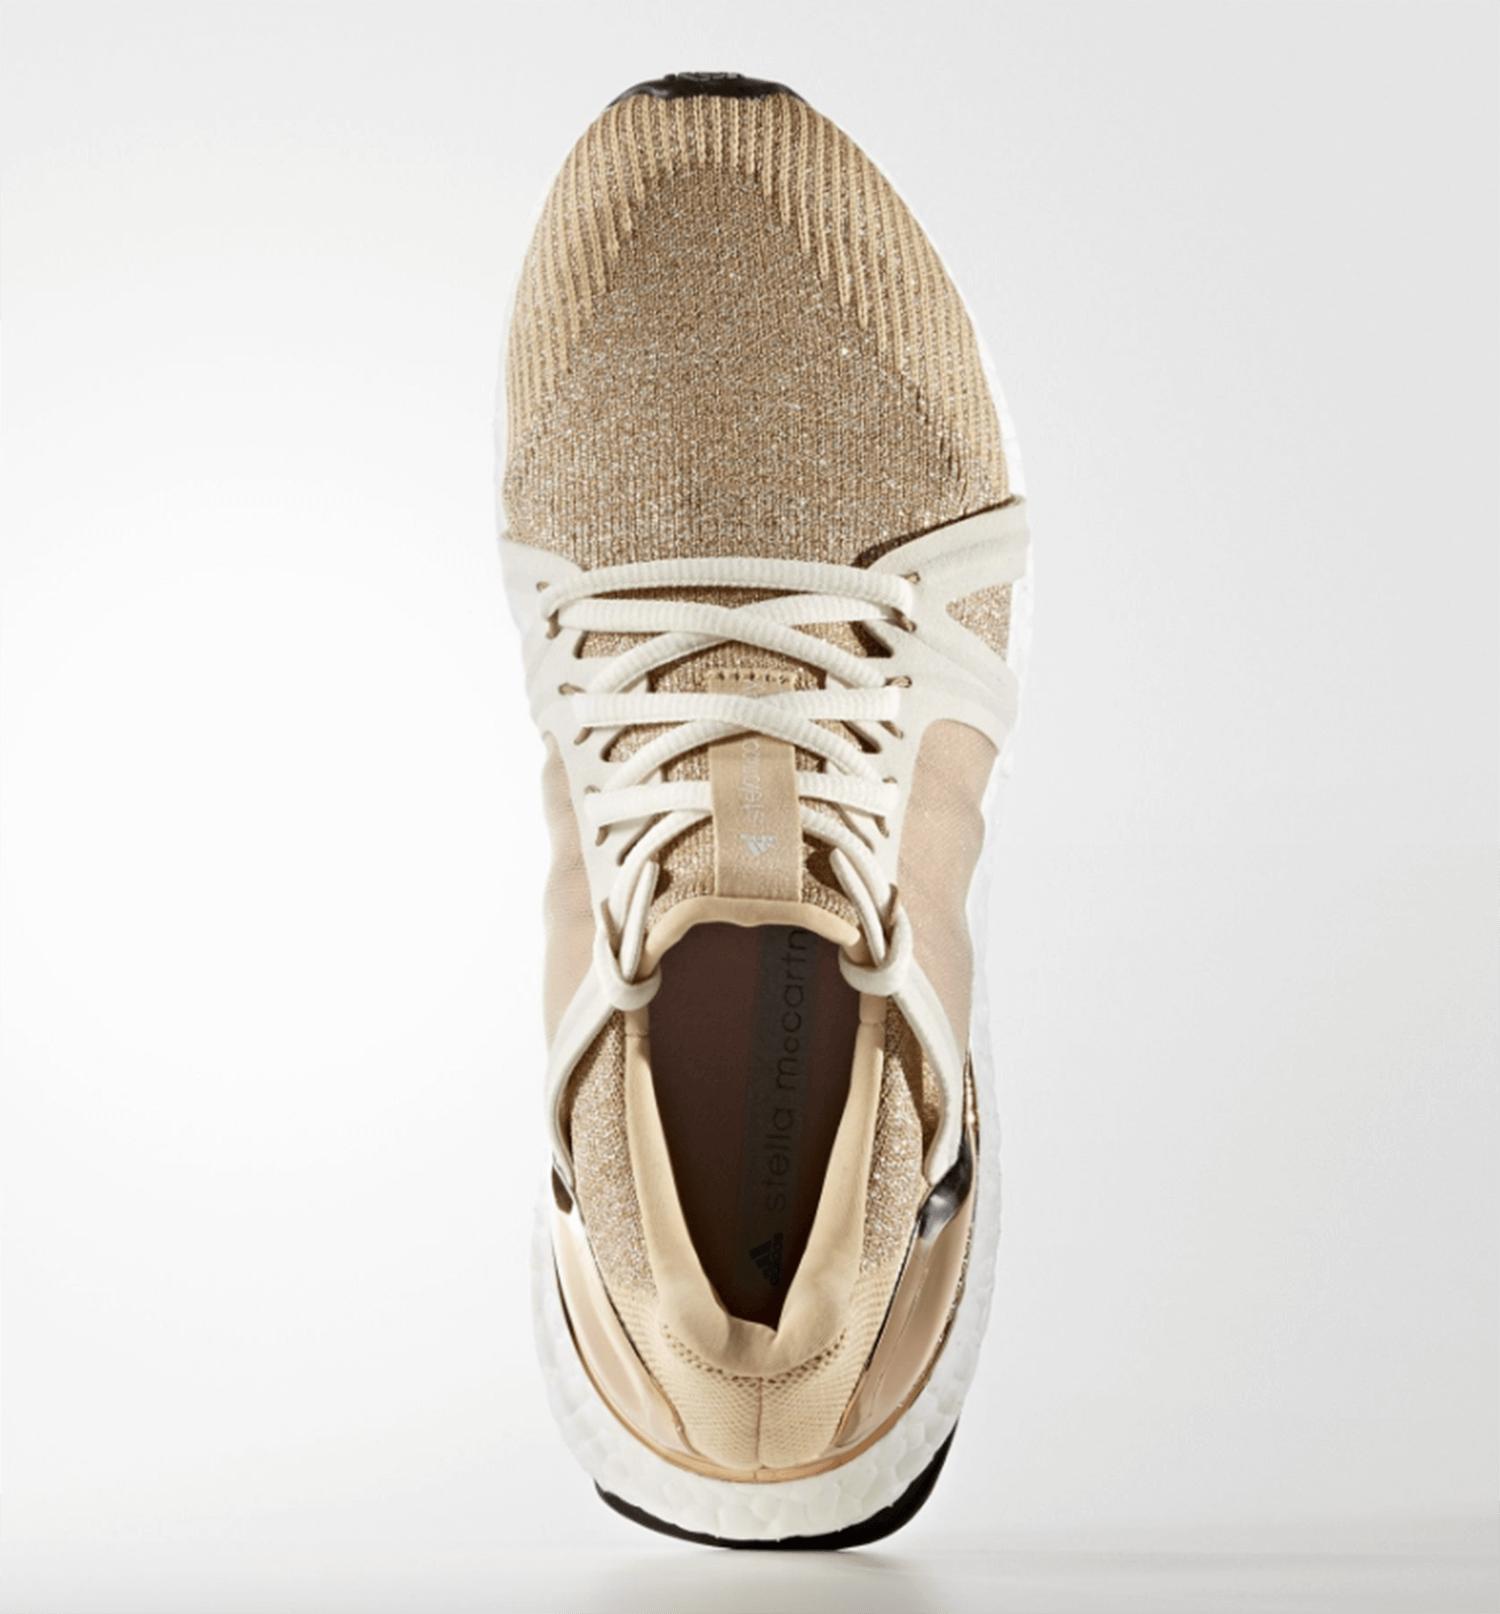 est-living-top-ten-sneakers-stella-mccartney-x-adidas-ultra-boost-